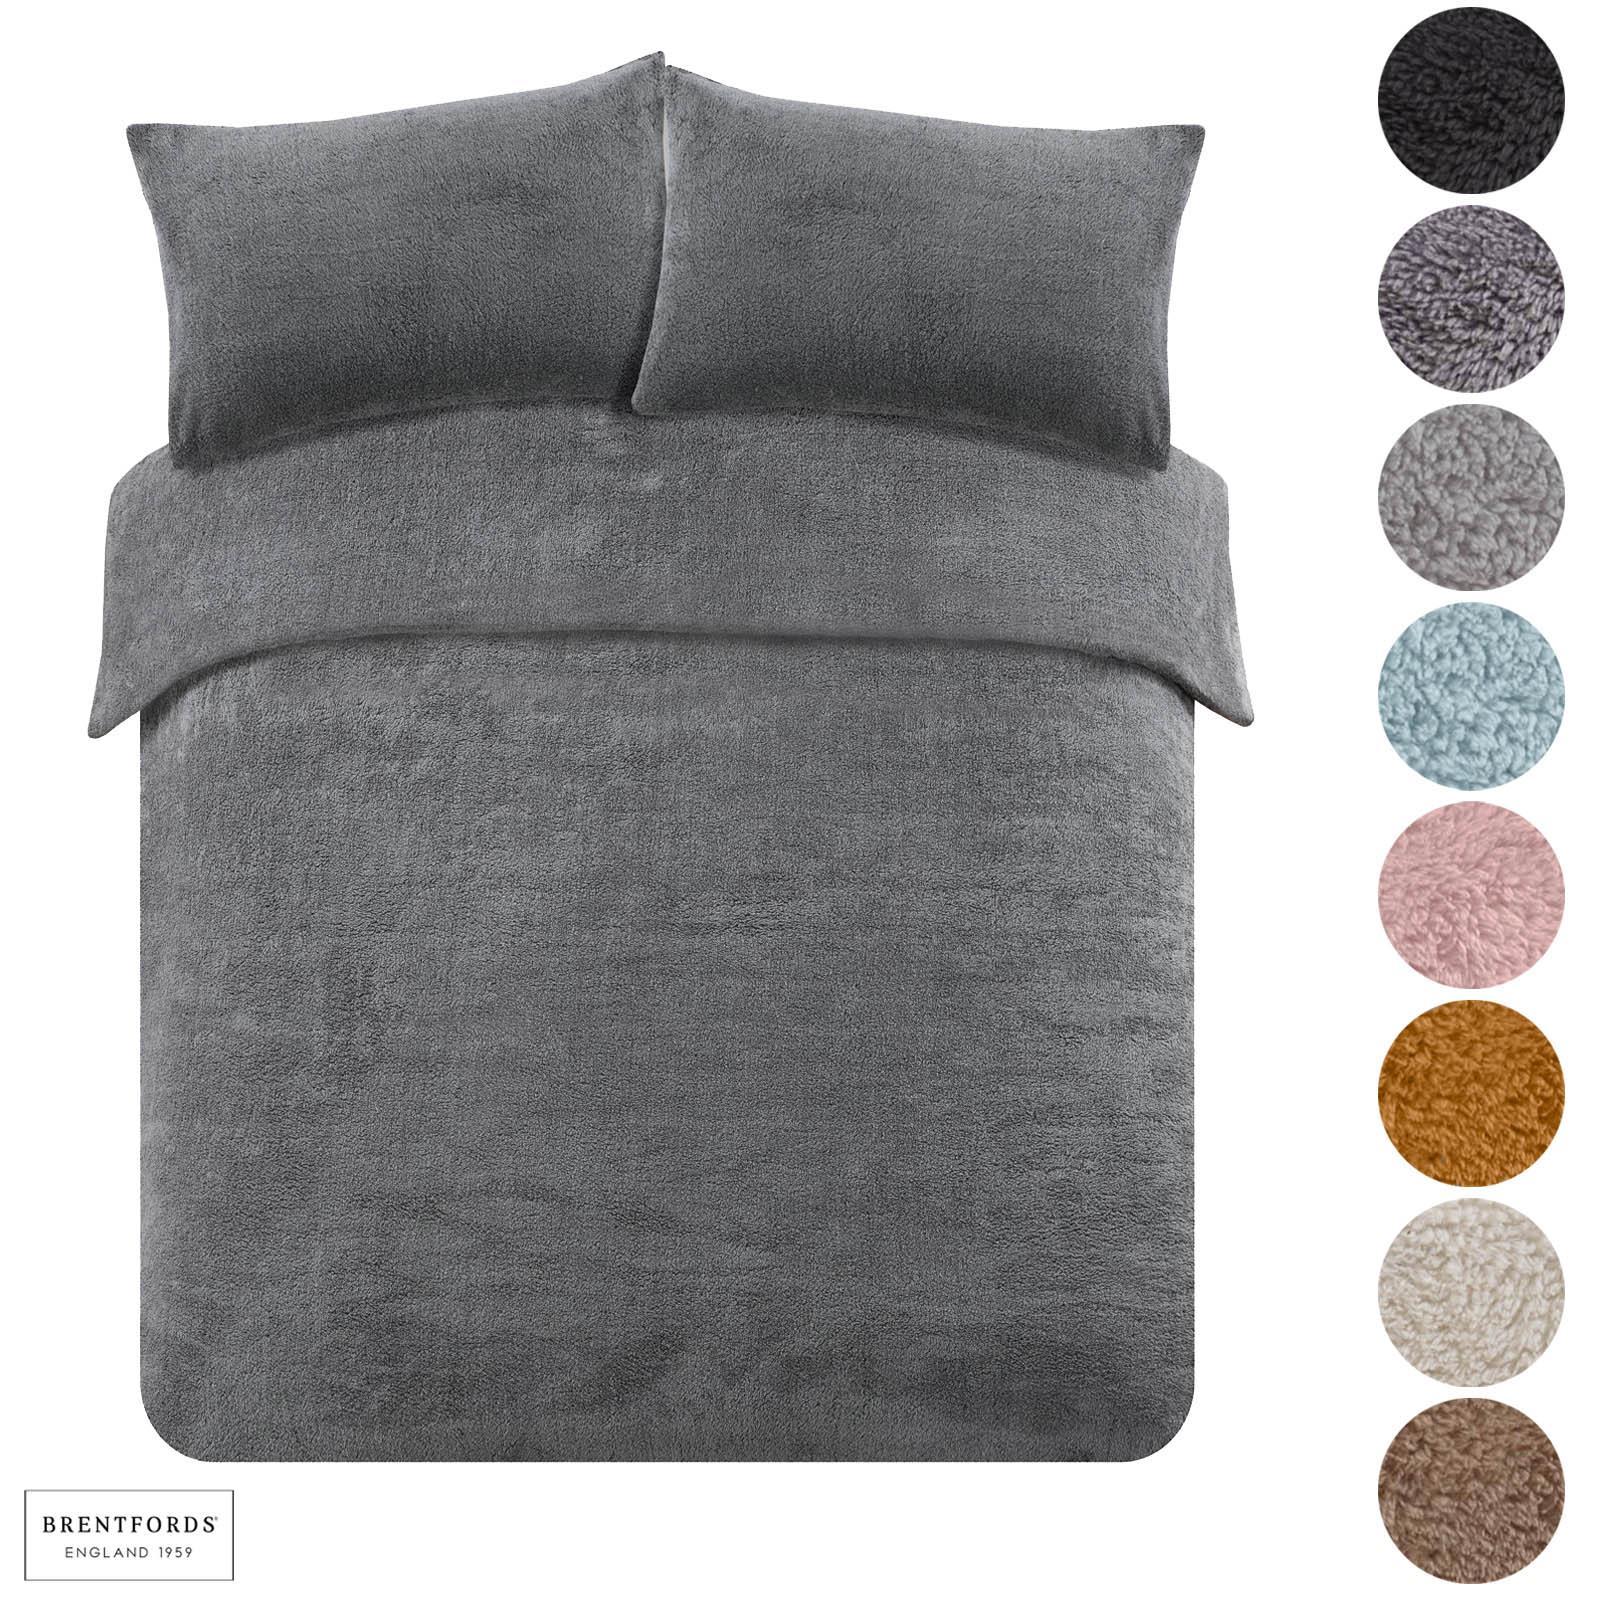 Brentfords Teddy Fleece Duvet Cover With Pillow Case Thermal Warm Bedding Set Ebay